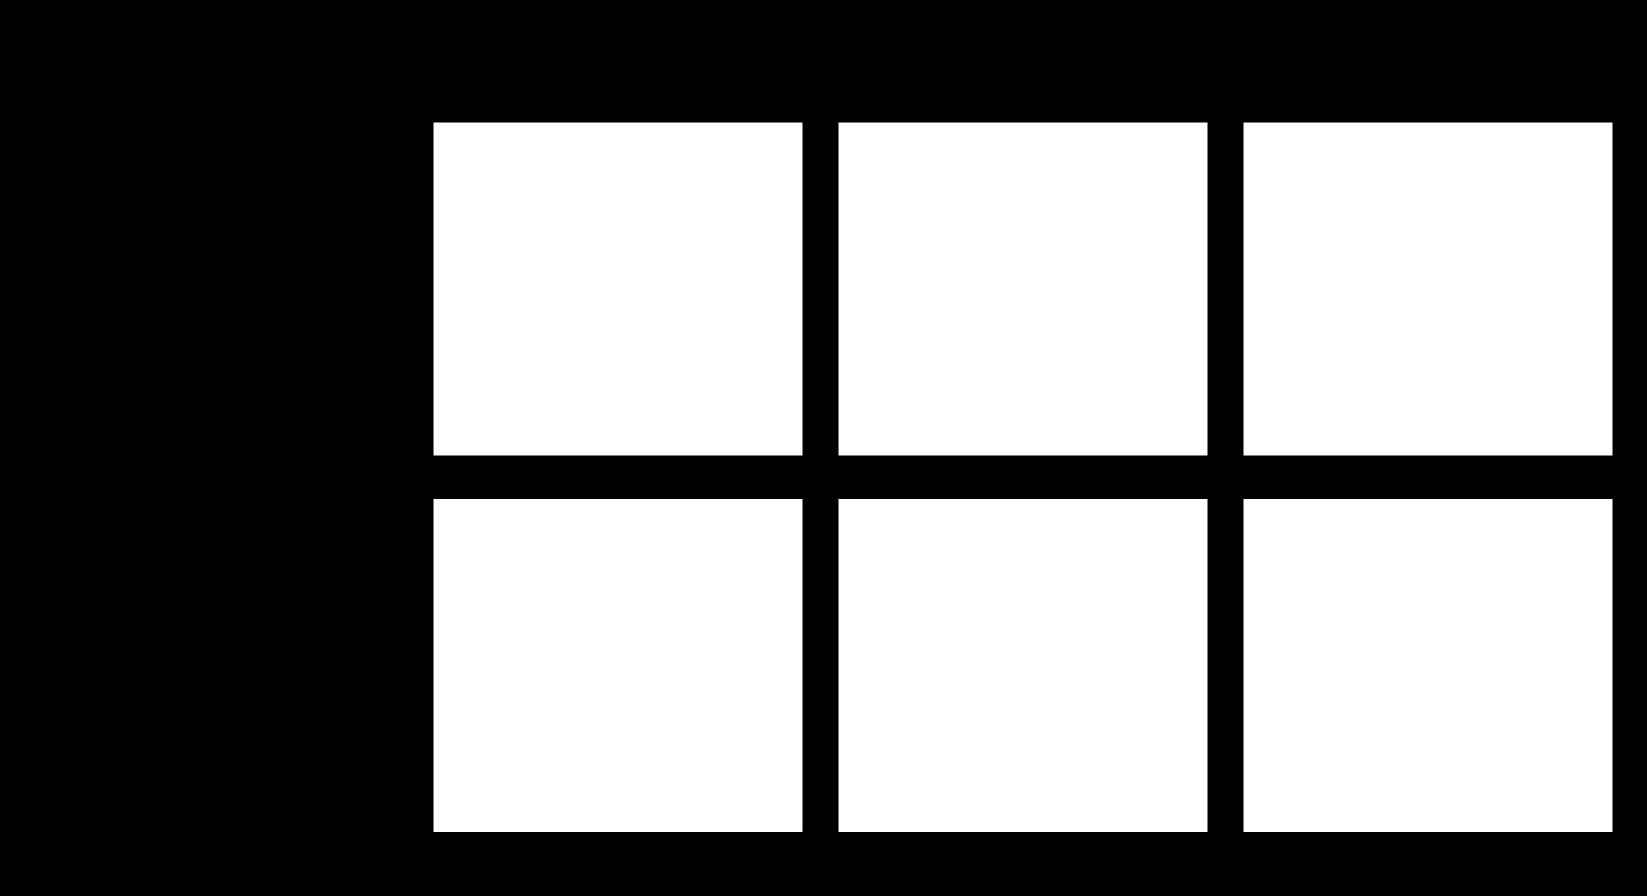 Grid - 3X2